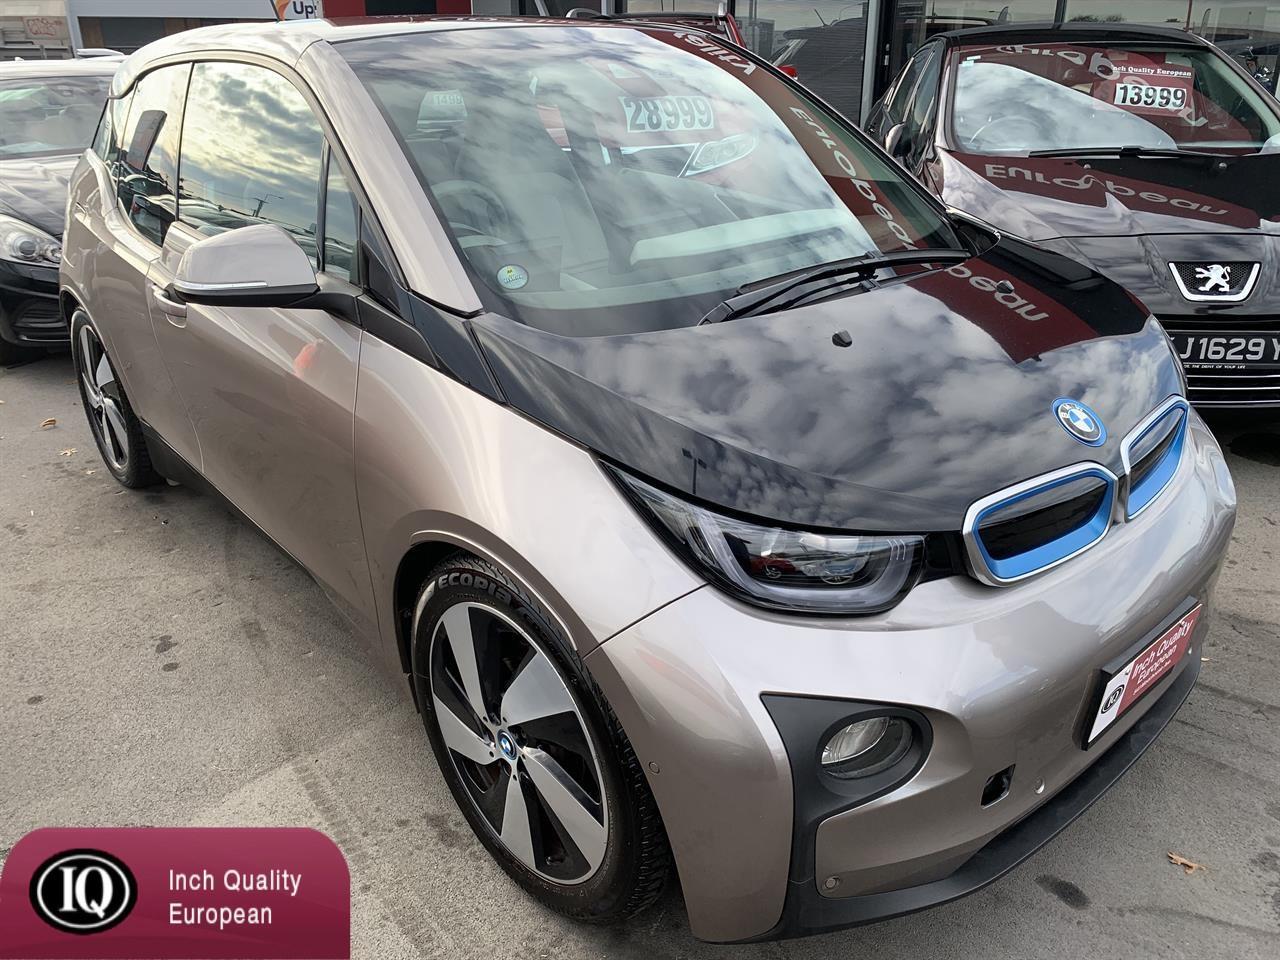 image-0, 2015 BMW i3 Full Electric at Christchurch